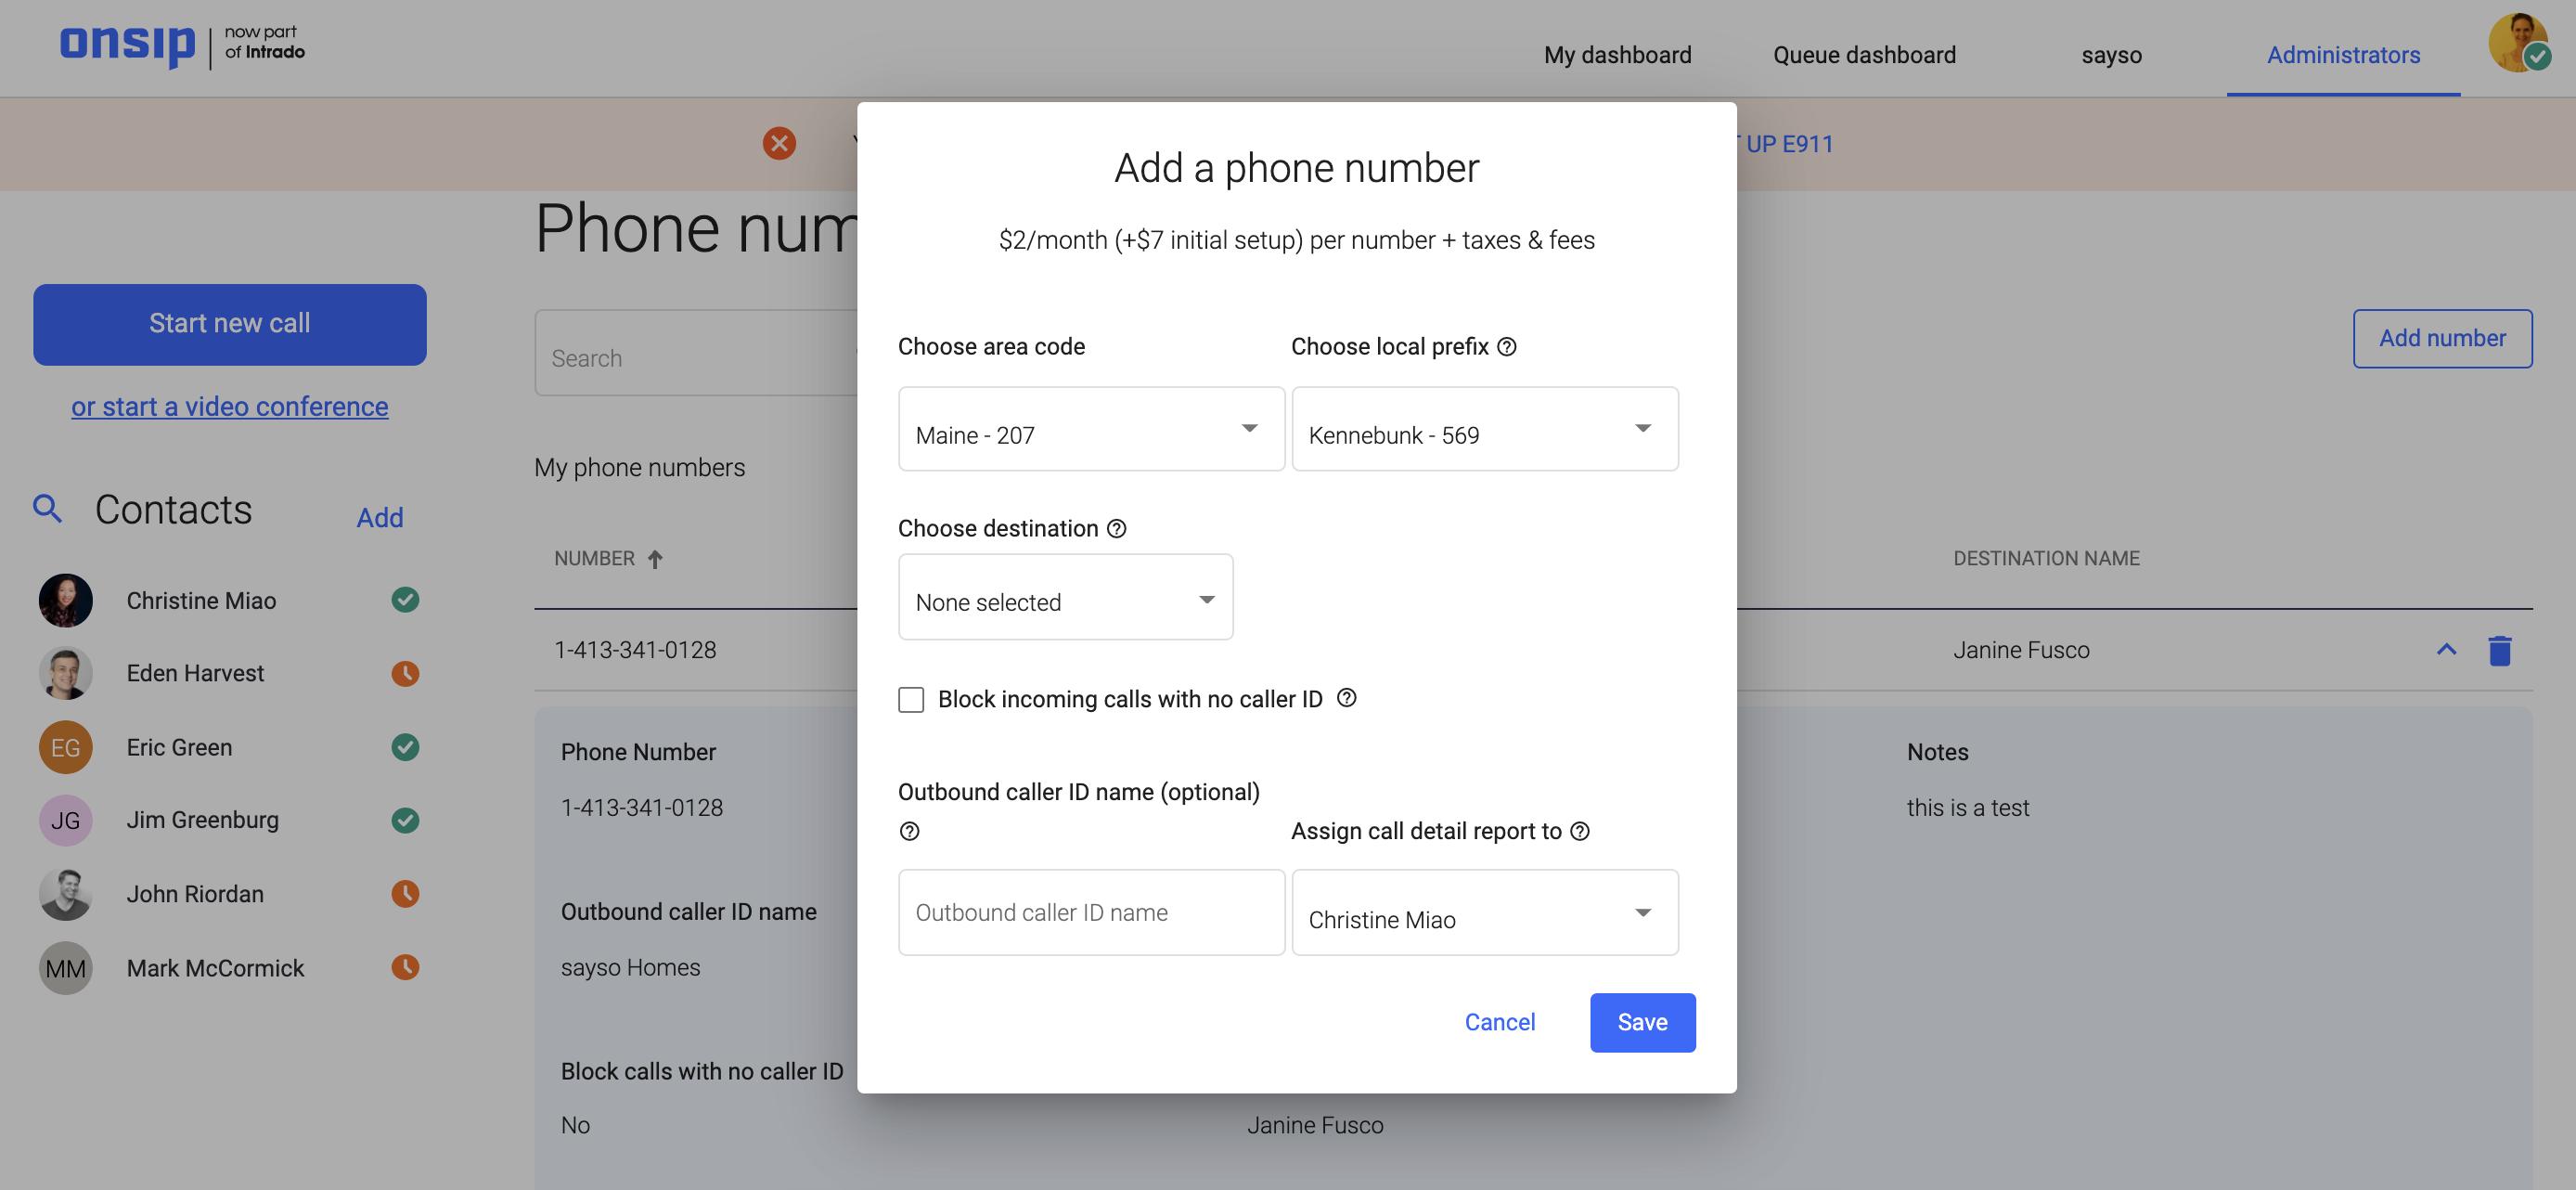 Screenshot of OnSIP Screenshot of the OnSIP Admin Portal adding phone number.